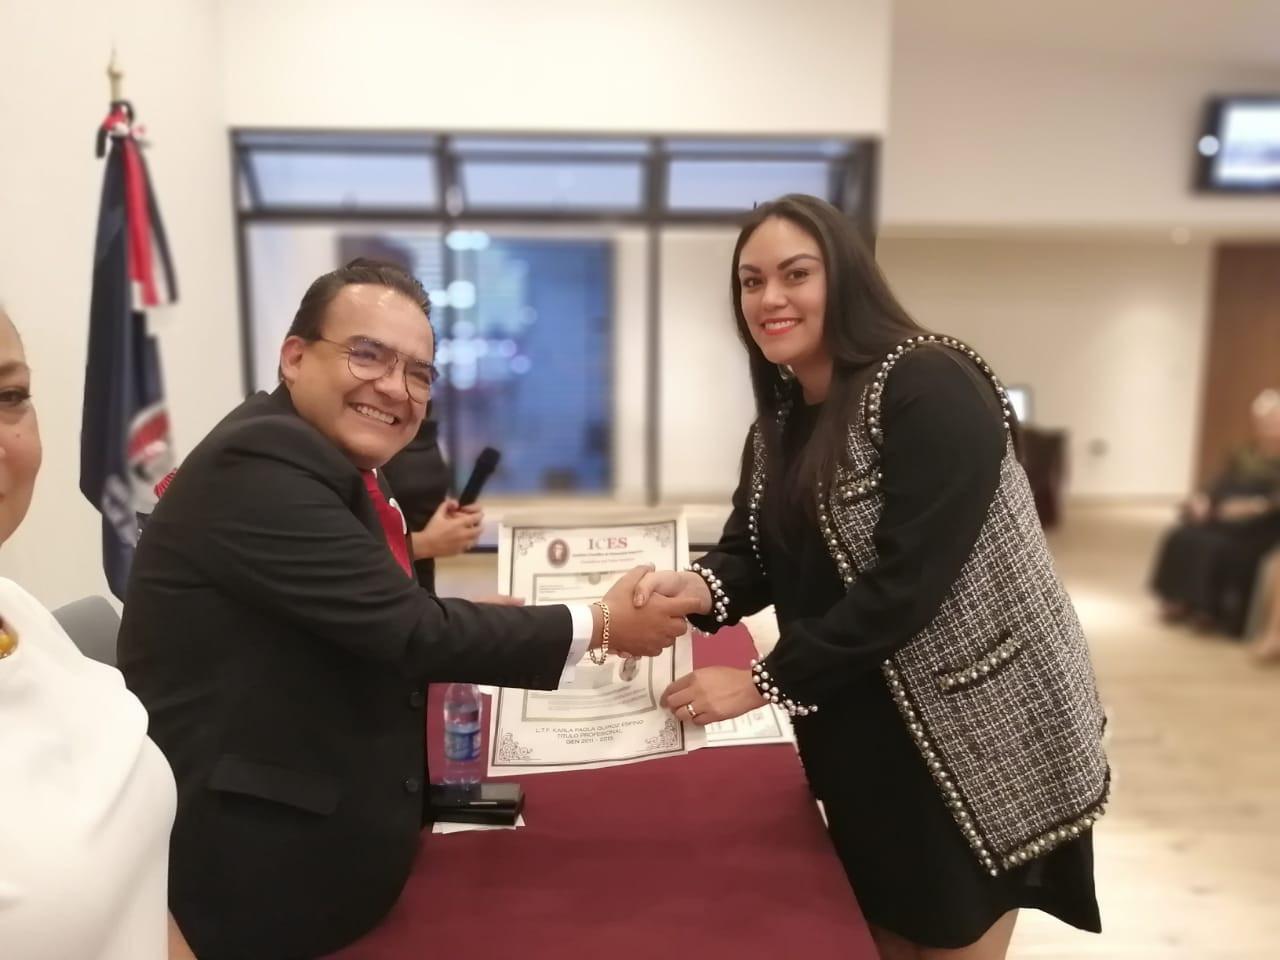 Karla Quiroz